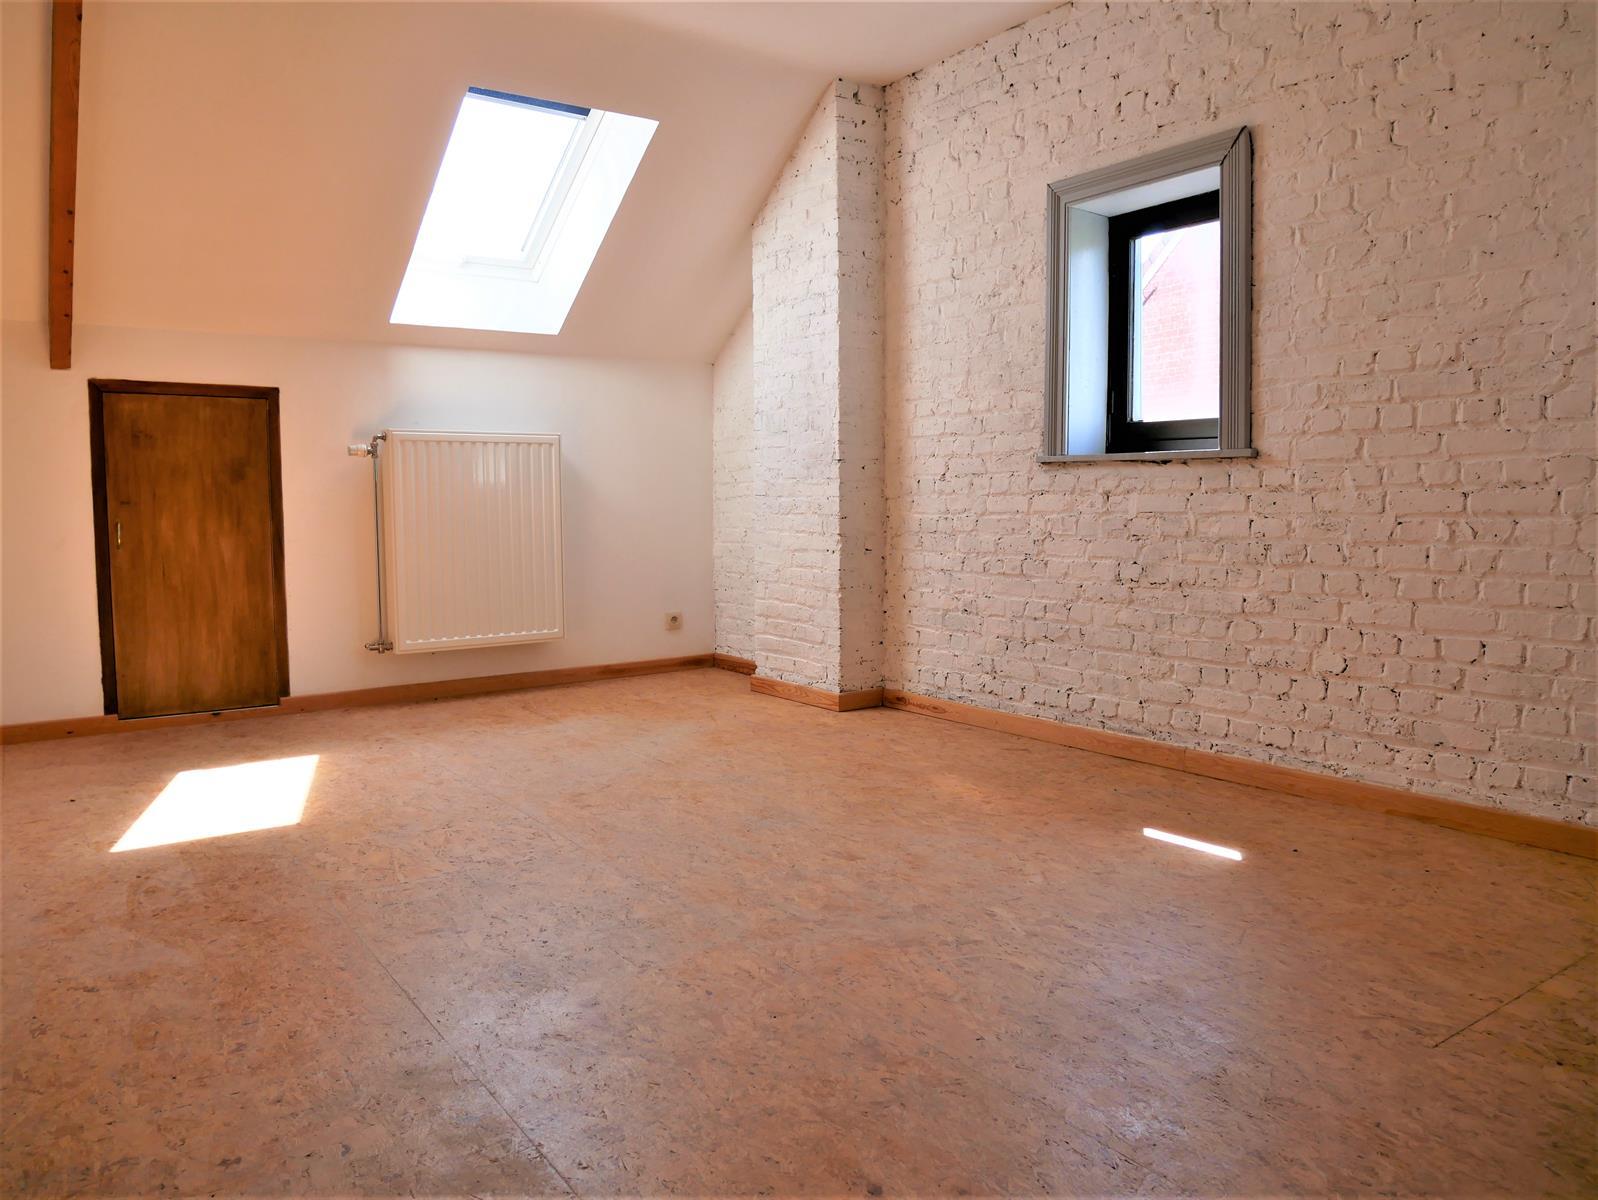 Maison - Ottignies-Louvain-la-Neuve - #4345933-11